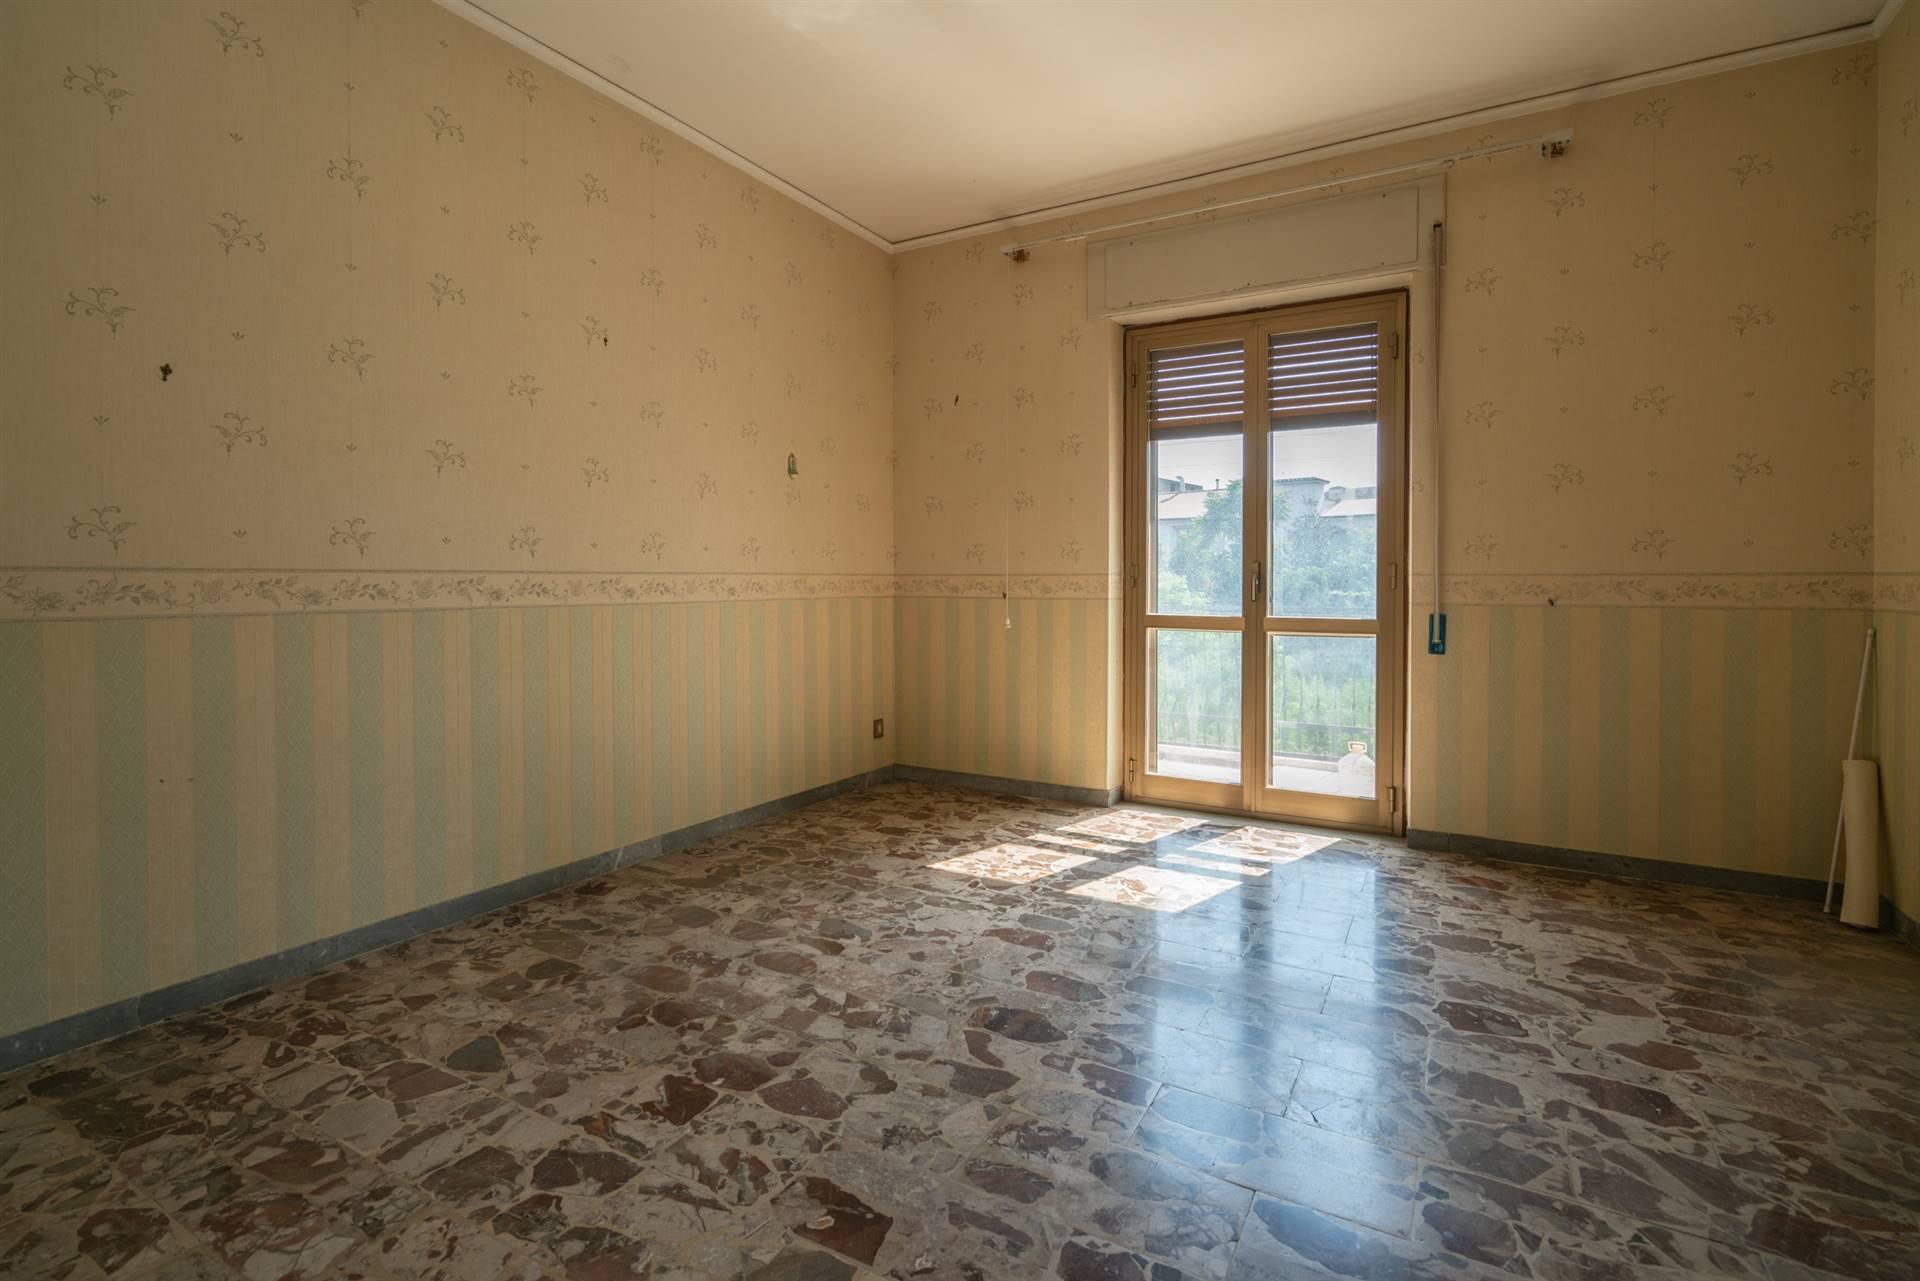 AV965C-Appartamento-SANTA-MARIA-CAPUA-VETERE-Via-Luigi-de-Michele